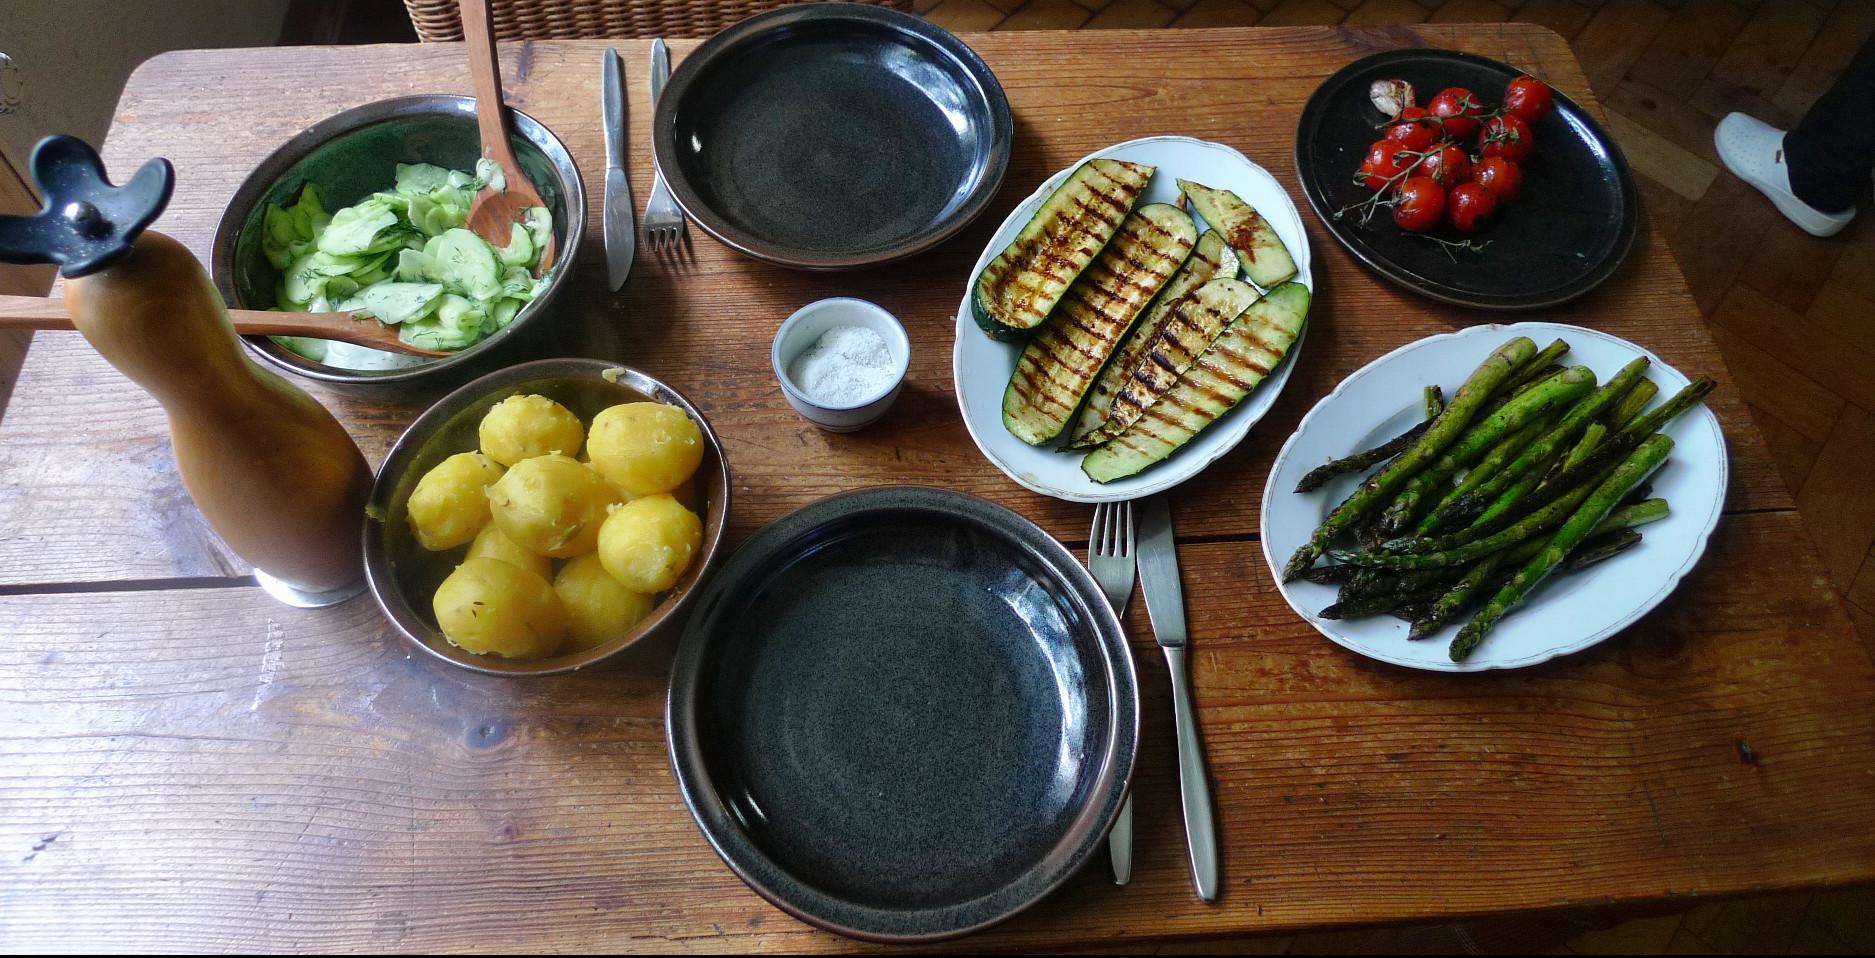 Spargel,Zucchini,Tomate,Gurkensalat,Kartoffeln -3.5.15   (8)